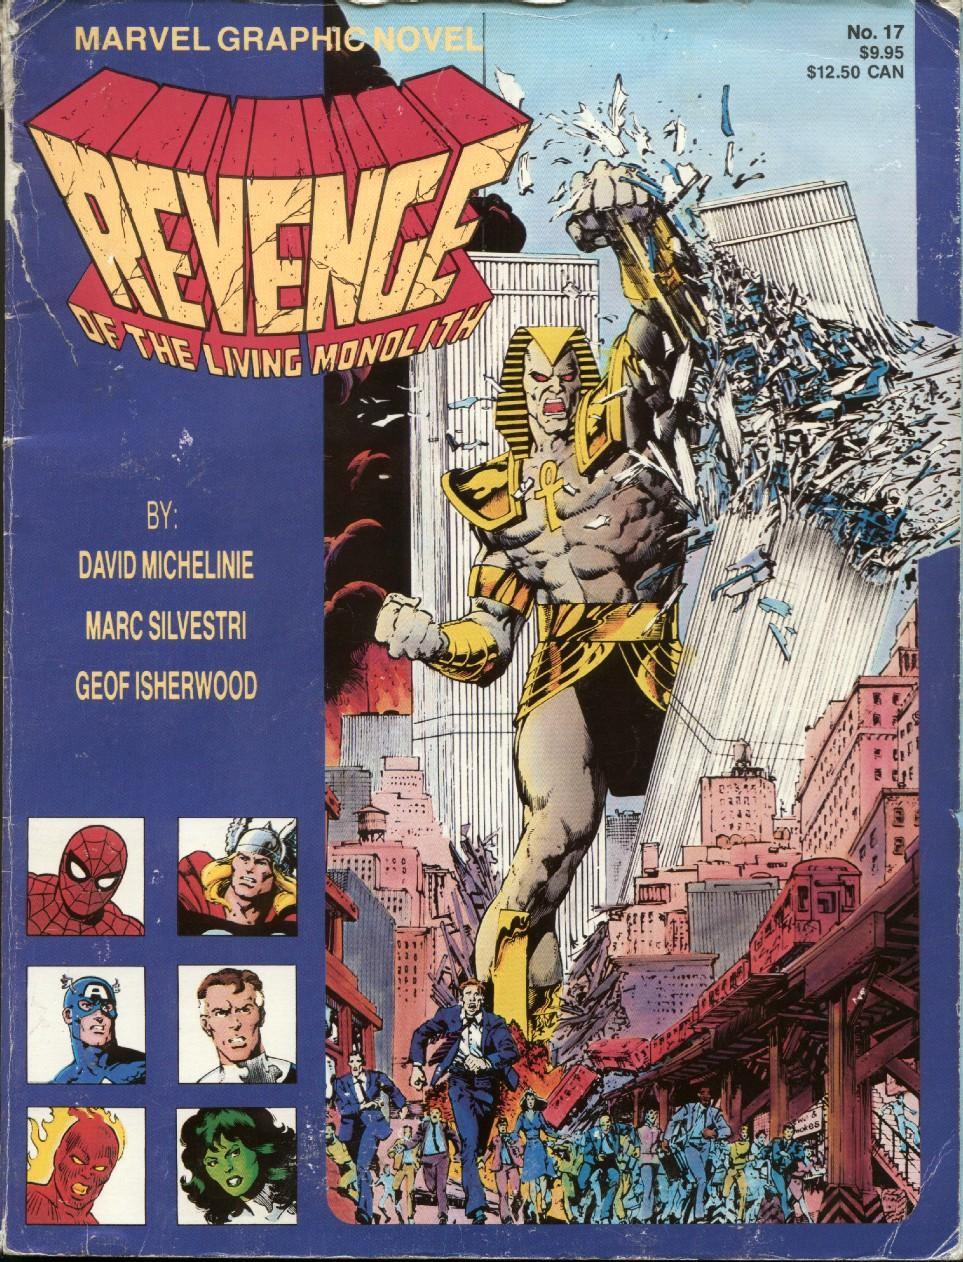 Marvel Graphic Novel 17_-_Revenge_of_the_Living_Monolith Page 1